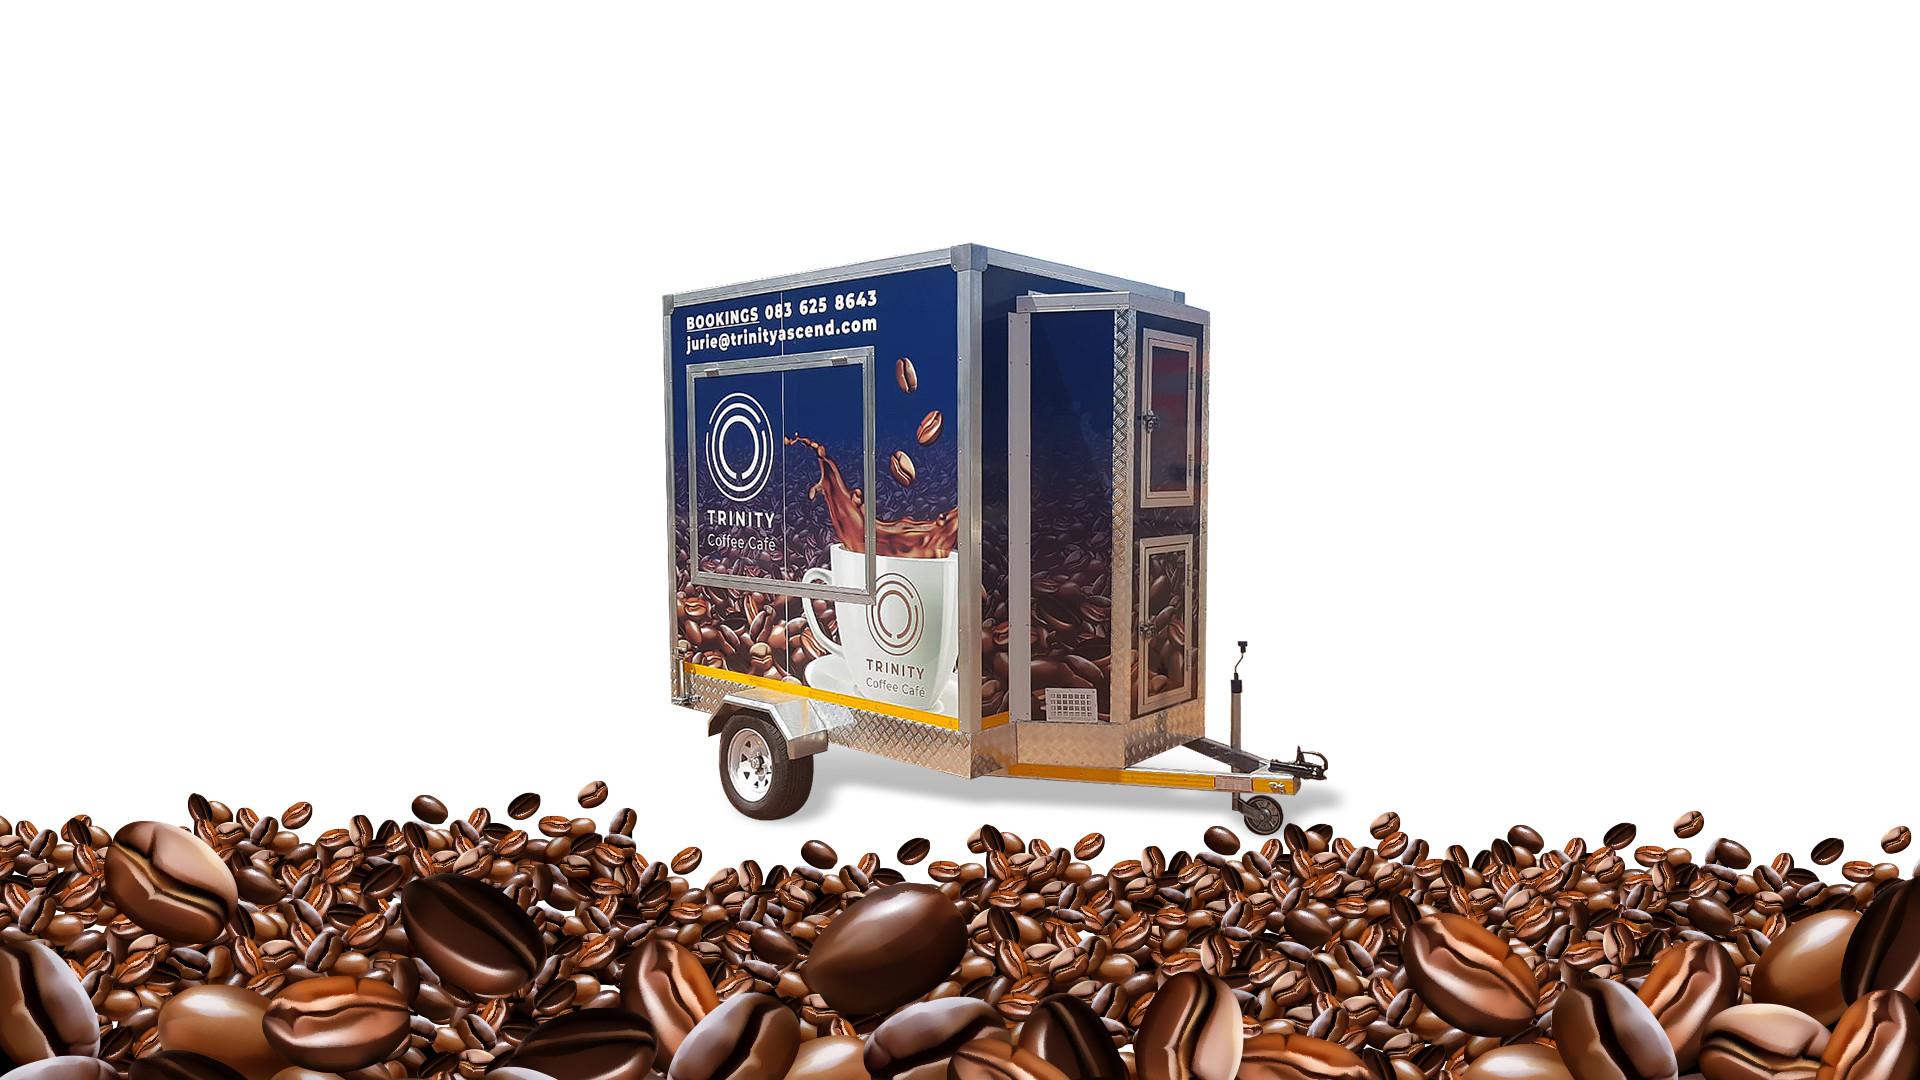 coffee trailer and beans bg.jpg